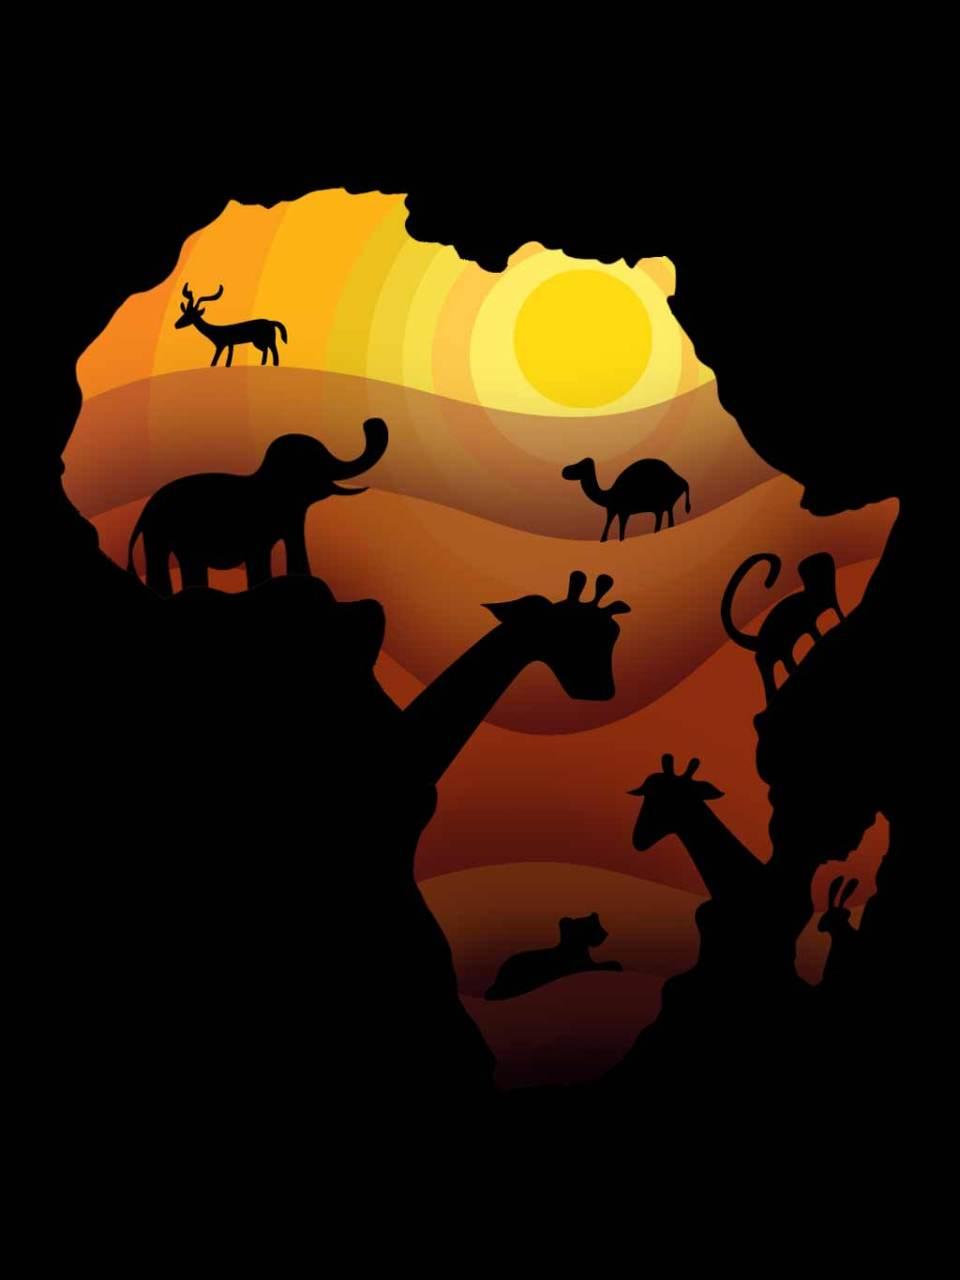 africaAnimalsFLat